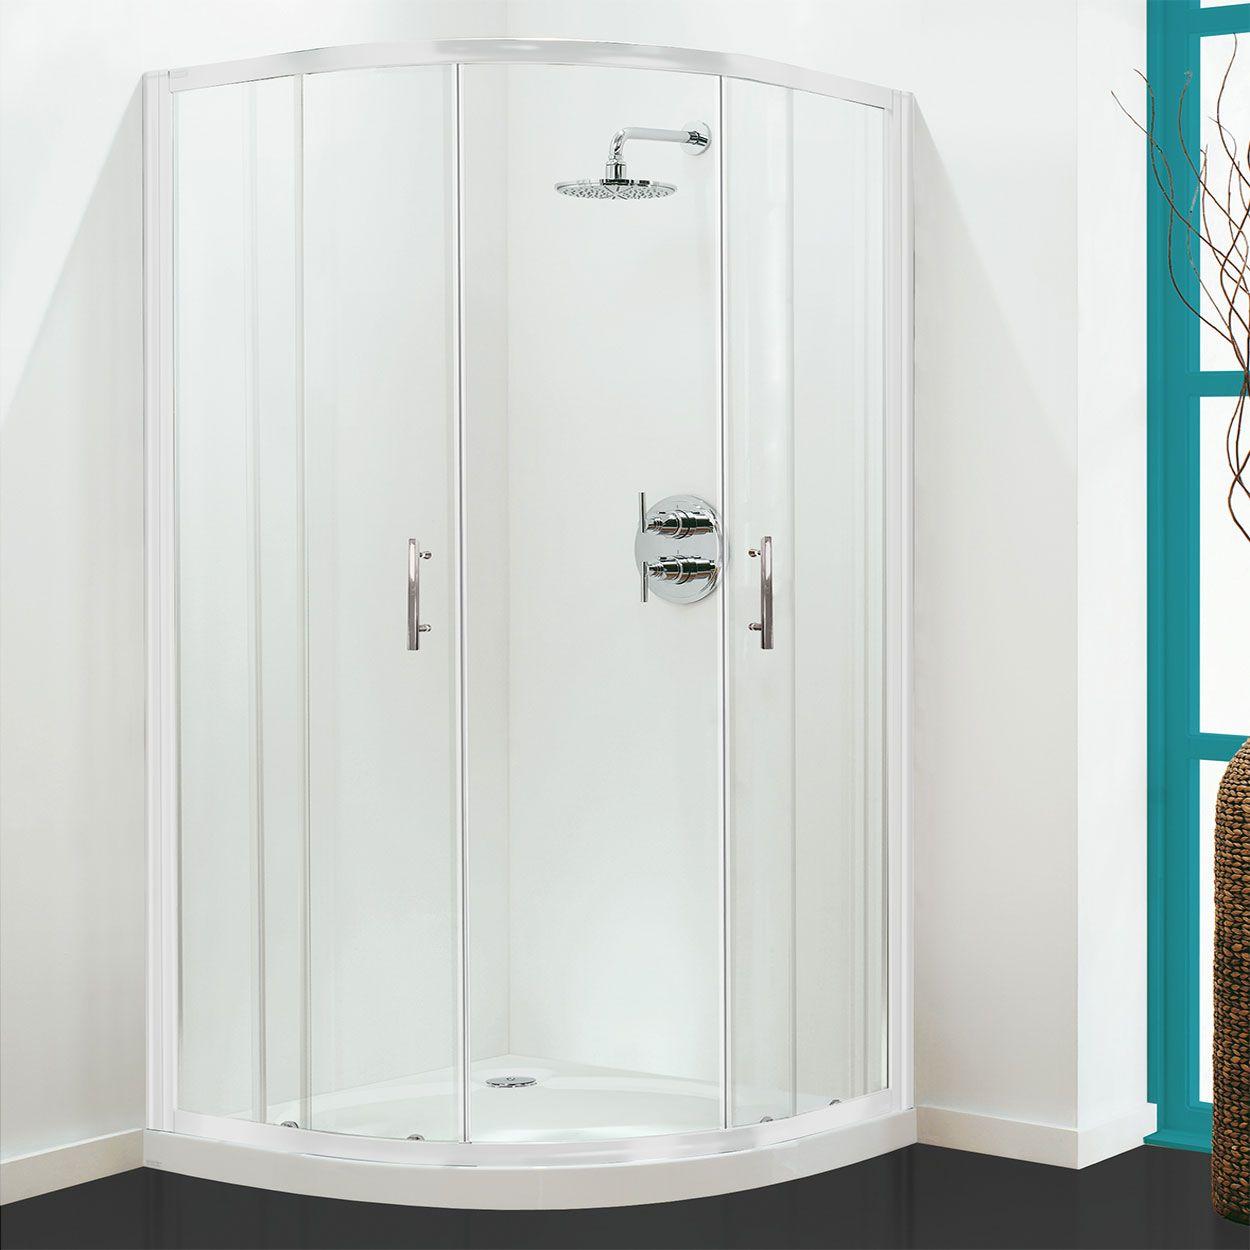 Coram Optima White Frame Quadrant Shower Enclosure 900mm X 900mm 6mm Plain Glass Quadrant Shower Enclosures Shower Enclosure Quadrant Shower